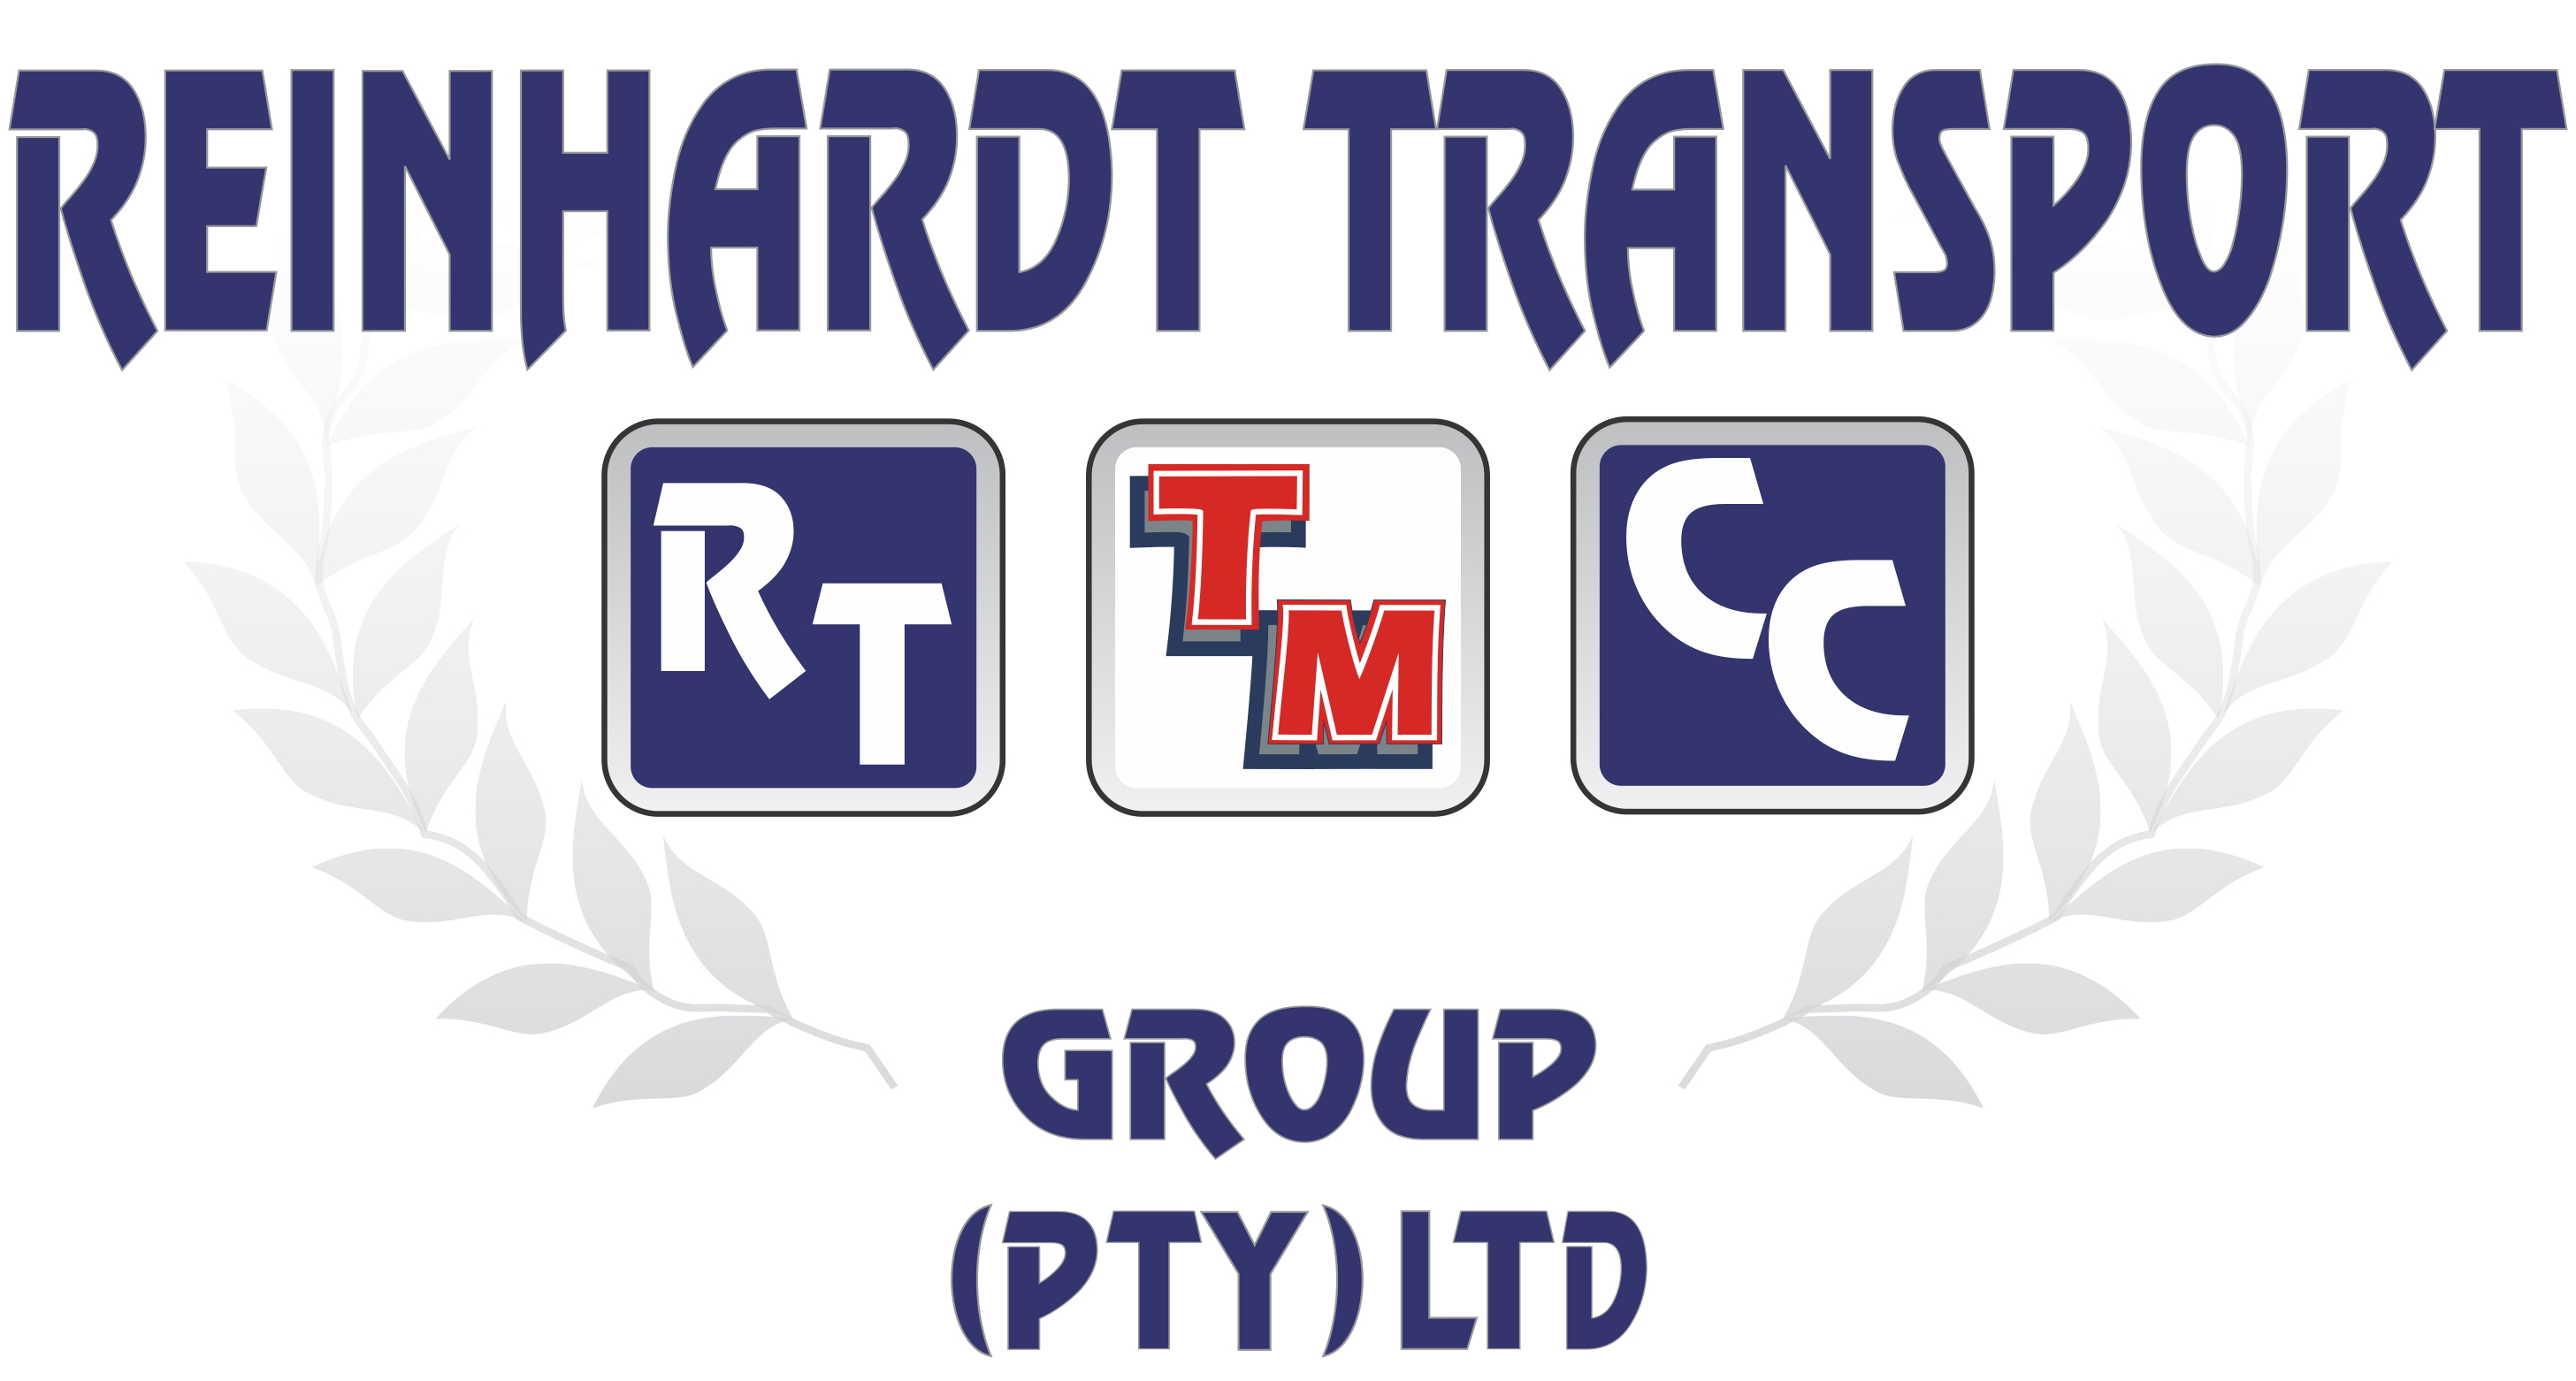 Contact Us Petroleum Coke Company Pty Ltd Mail: Reinhardt Transport Group Pty Ltd